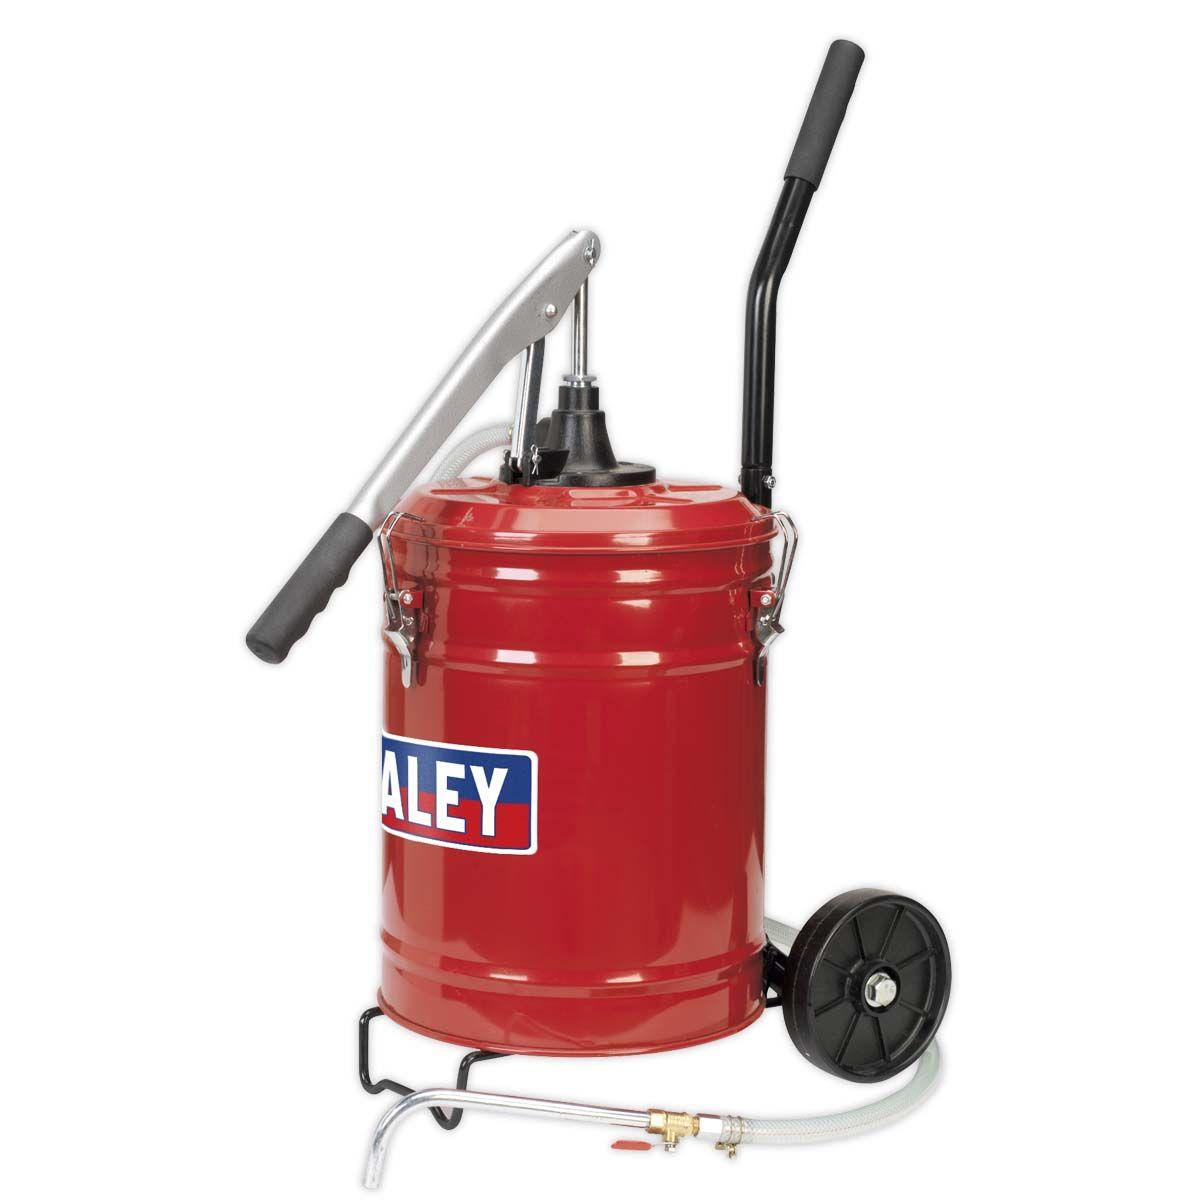 Sealey Gear Oil Dispensing Unit 20L Mobile